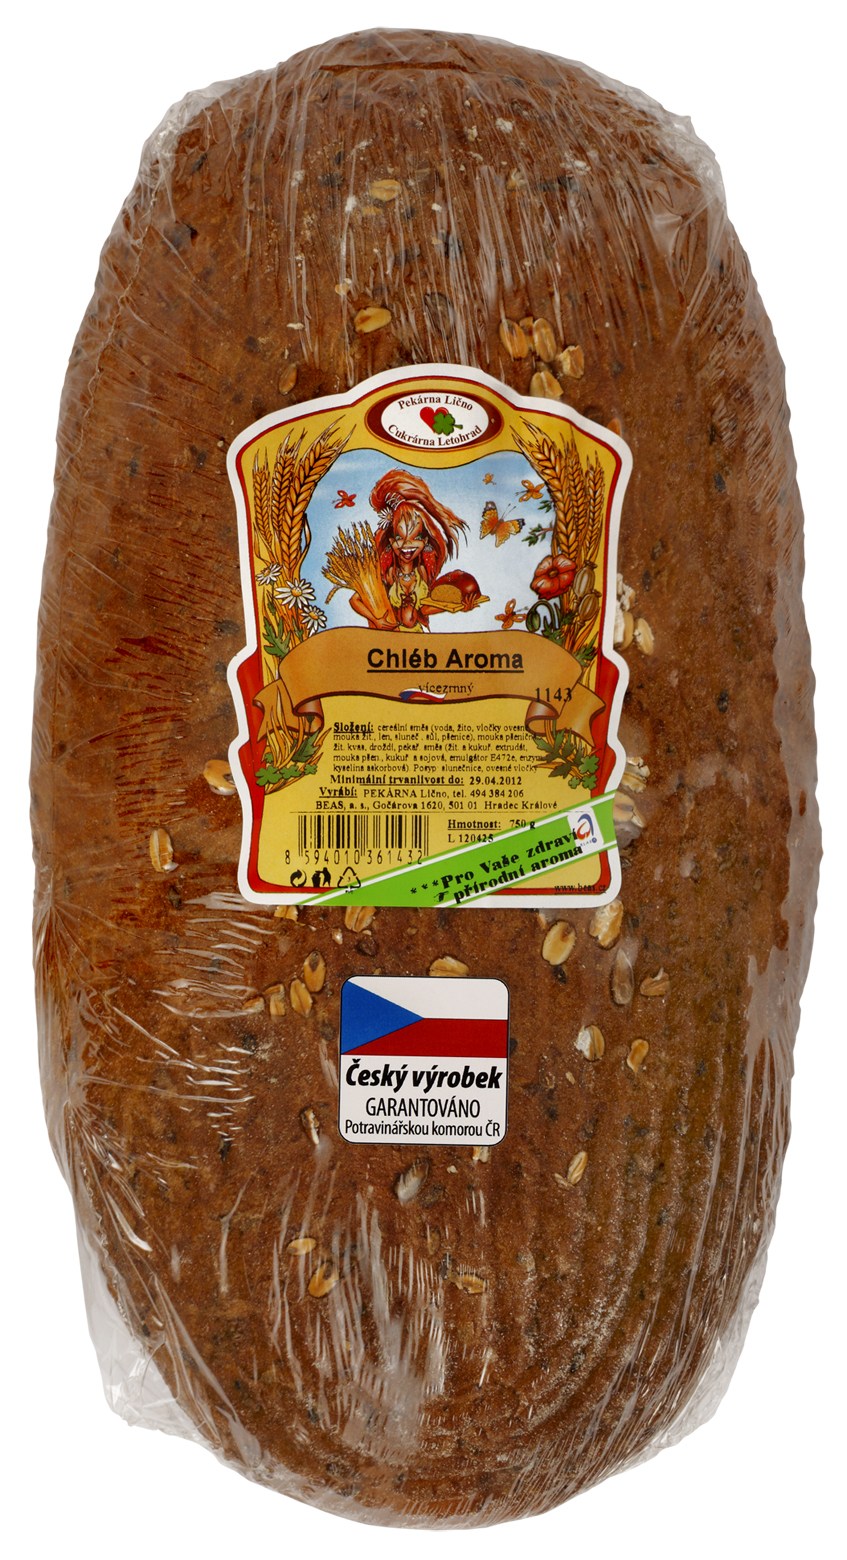 Značka Beas chléb Aroma